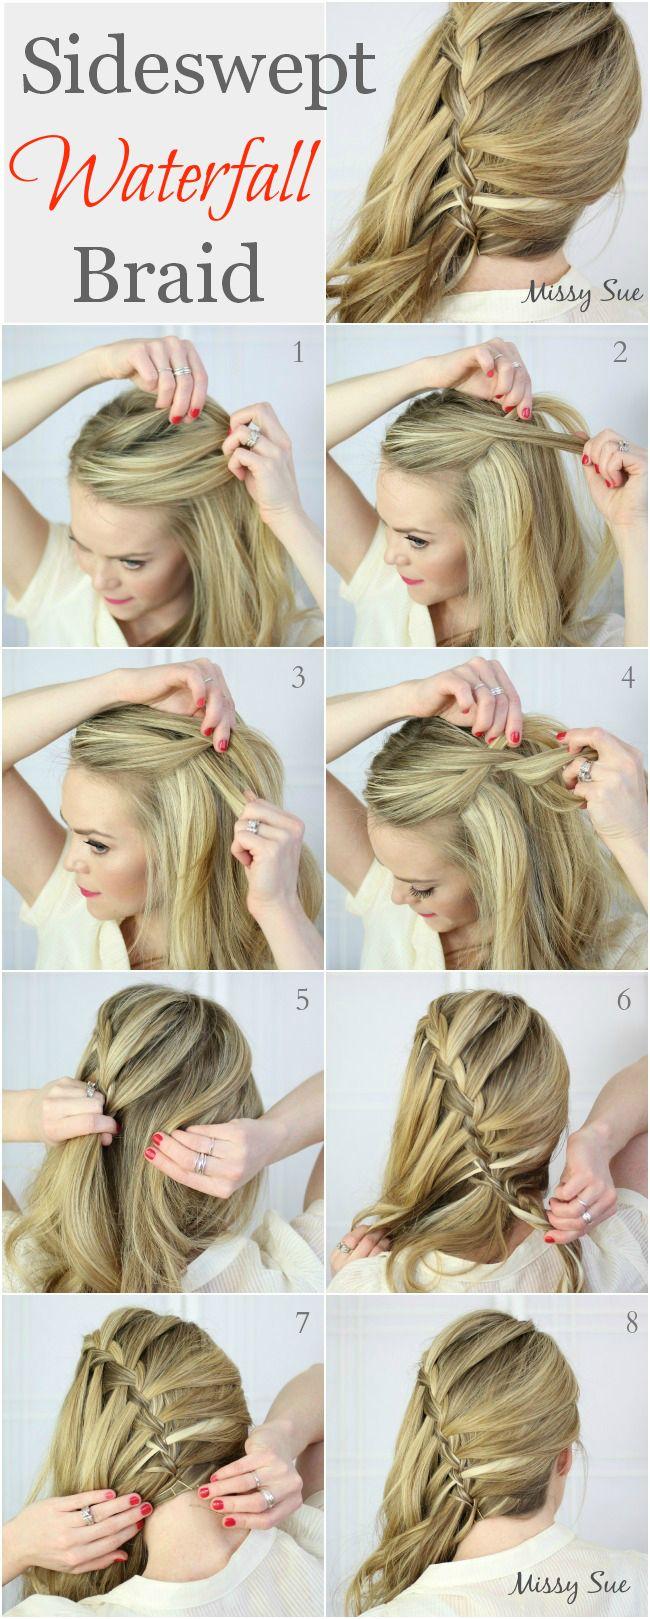 Fabulous 1000 Ideas About Waterfall Braids On Pinterest Braids Fishtail Short Hairstyles For Black Women Fulllsitofus